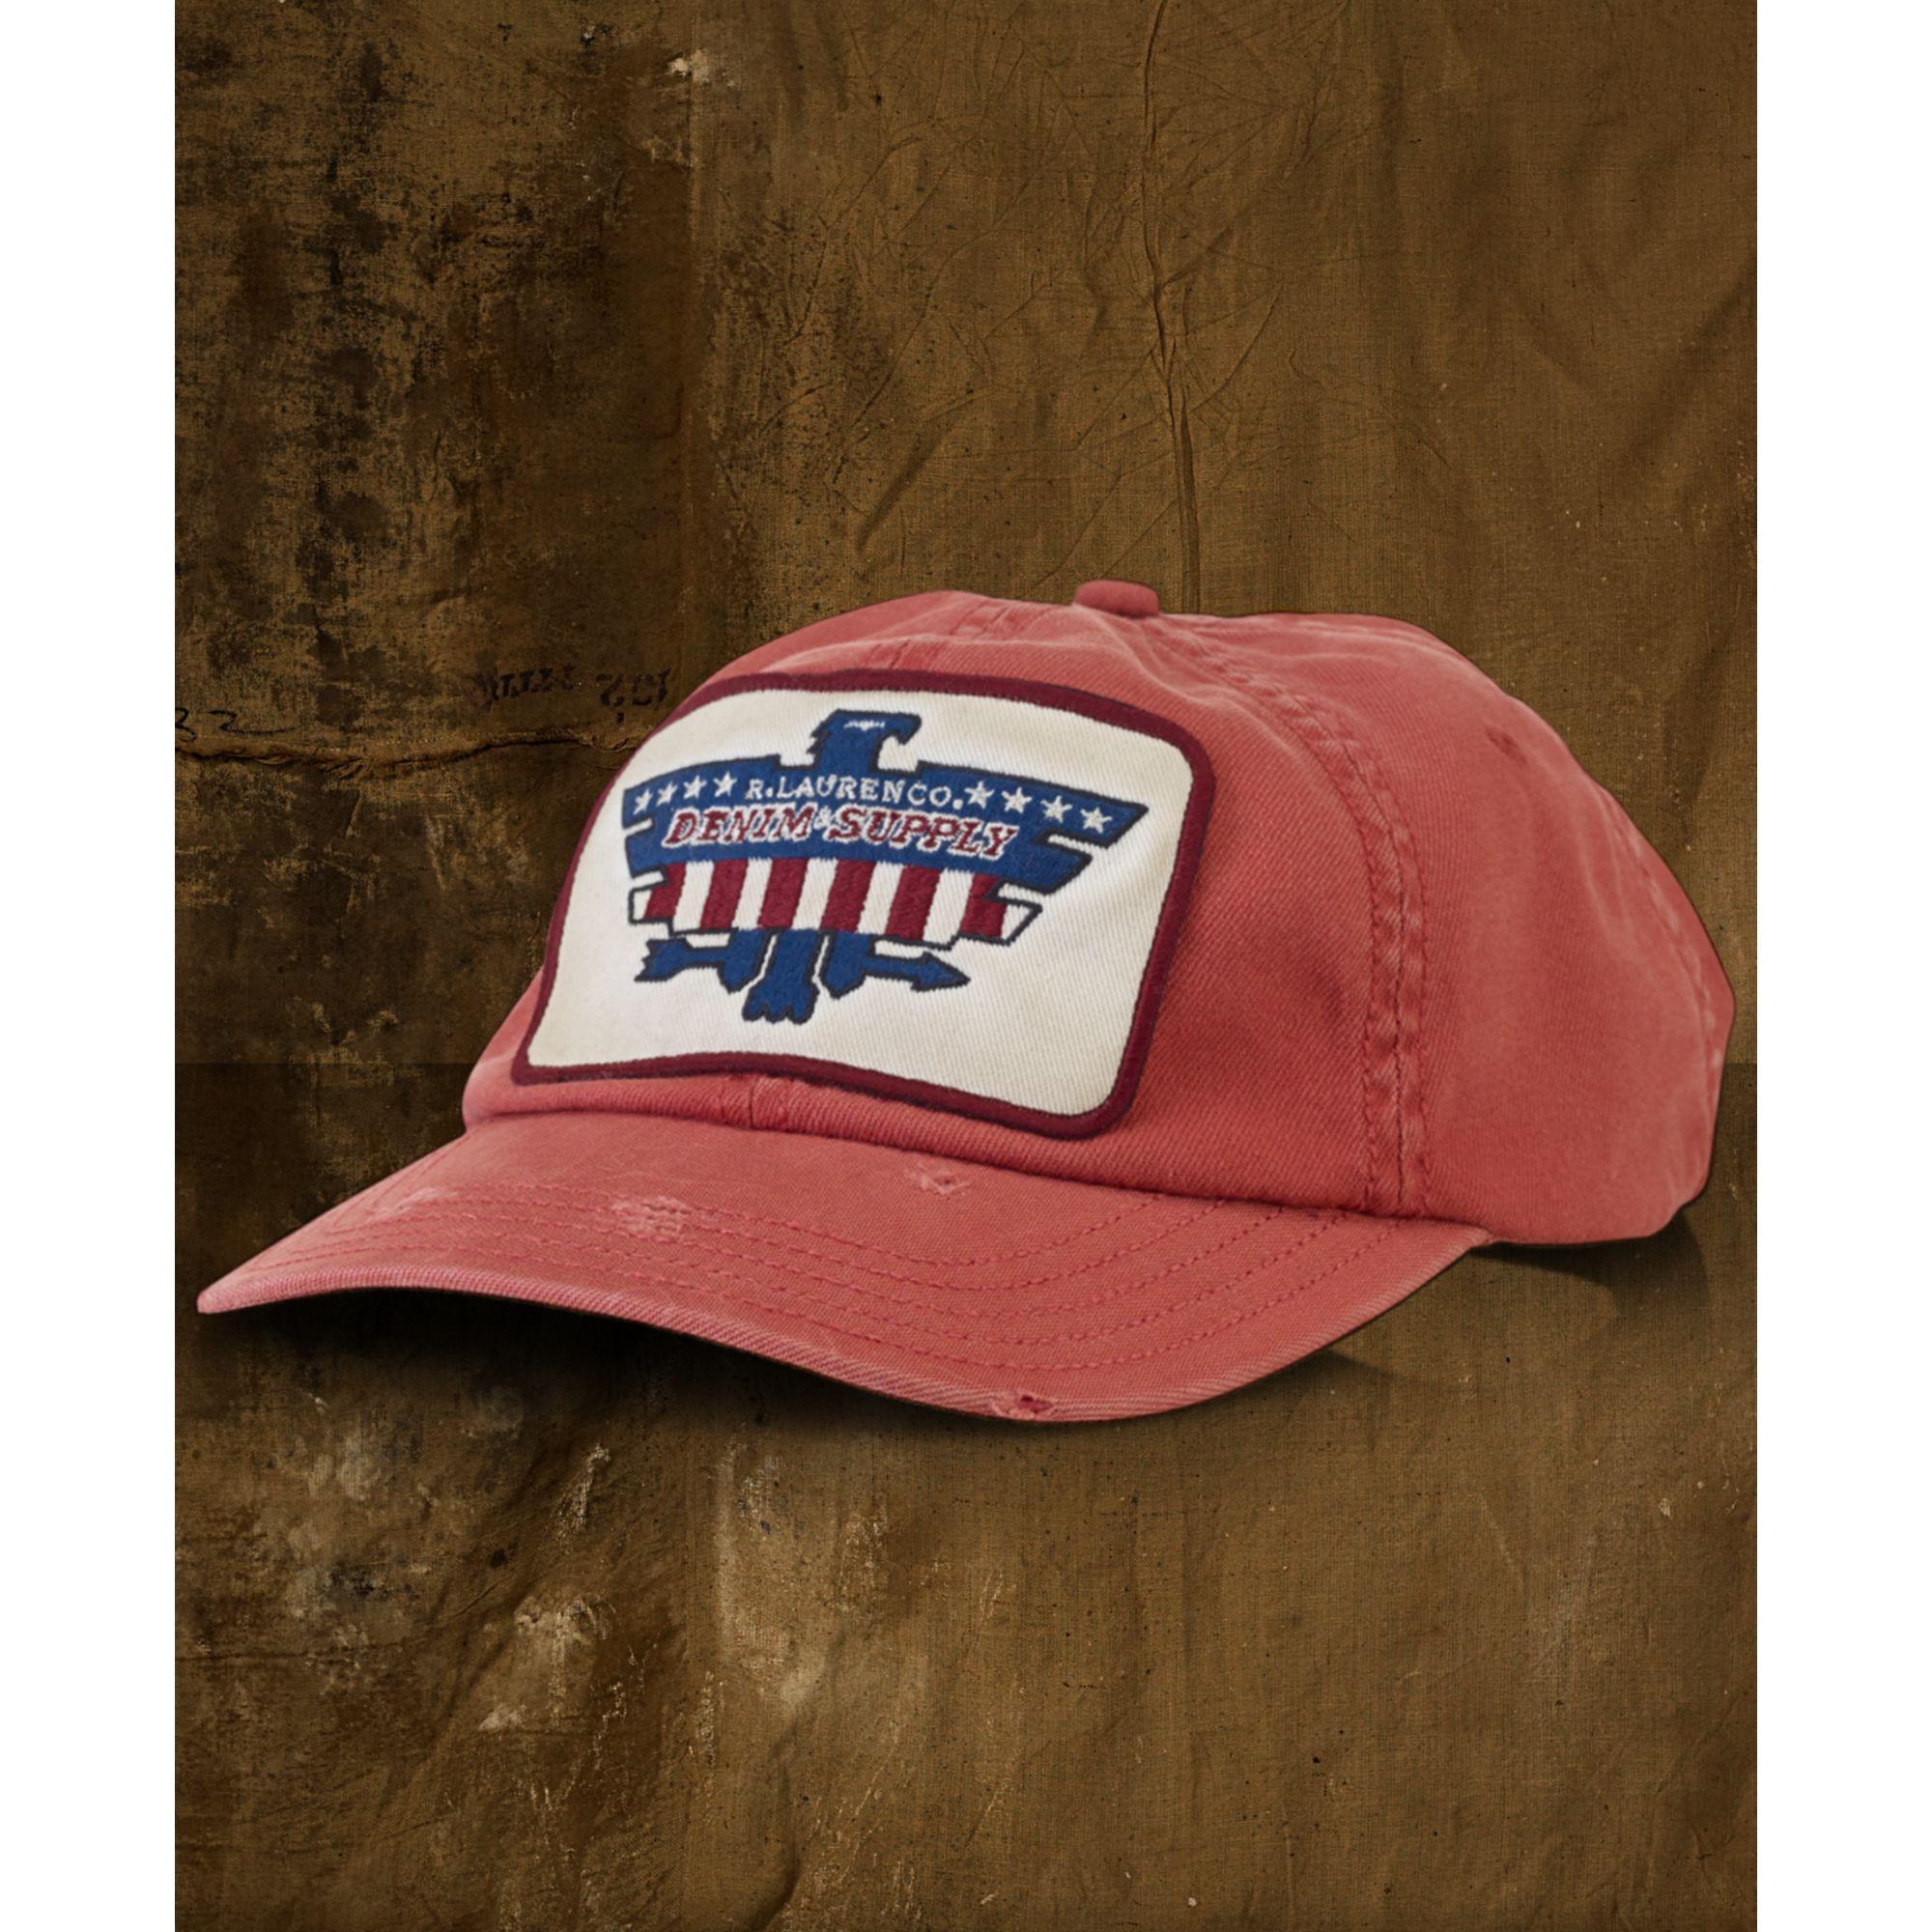 a581e7737cc Lyst - Denim   Supply Ralph Lauren Twill Eaglepatch Baseball Cap in ...